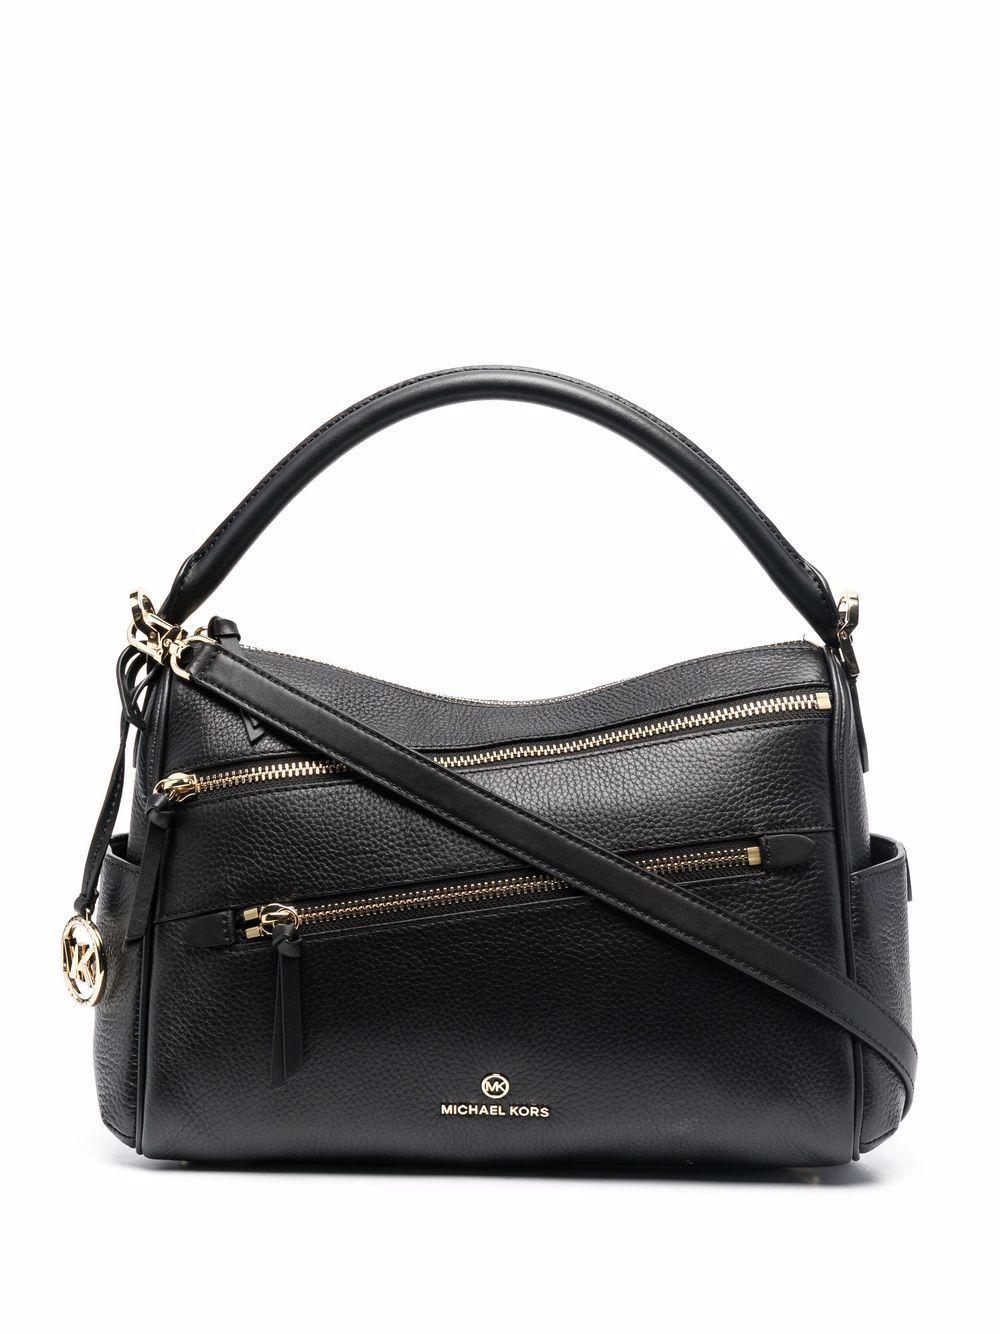 Lorimer leather handbag